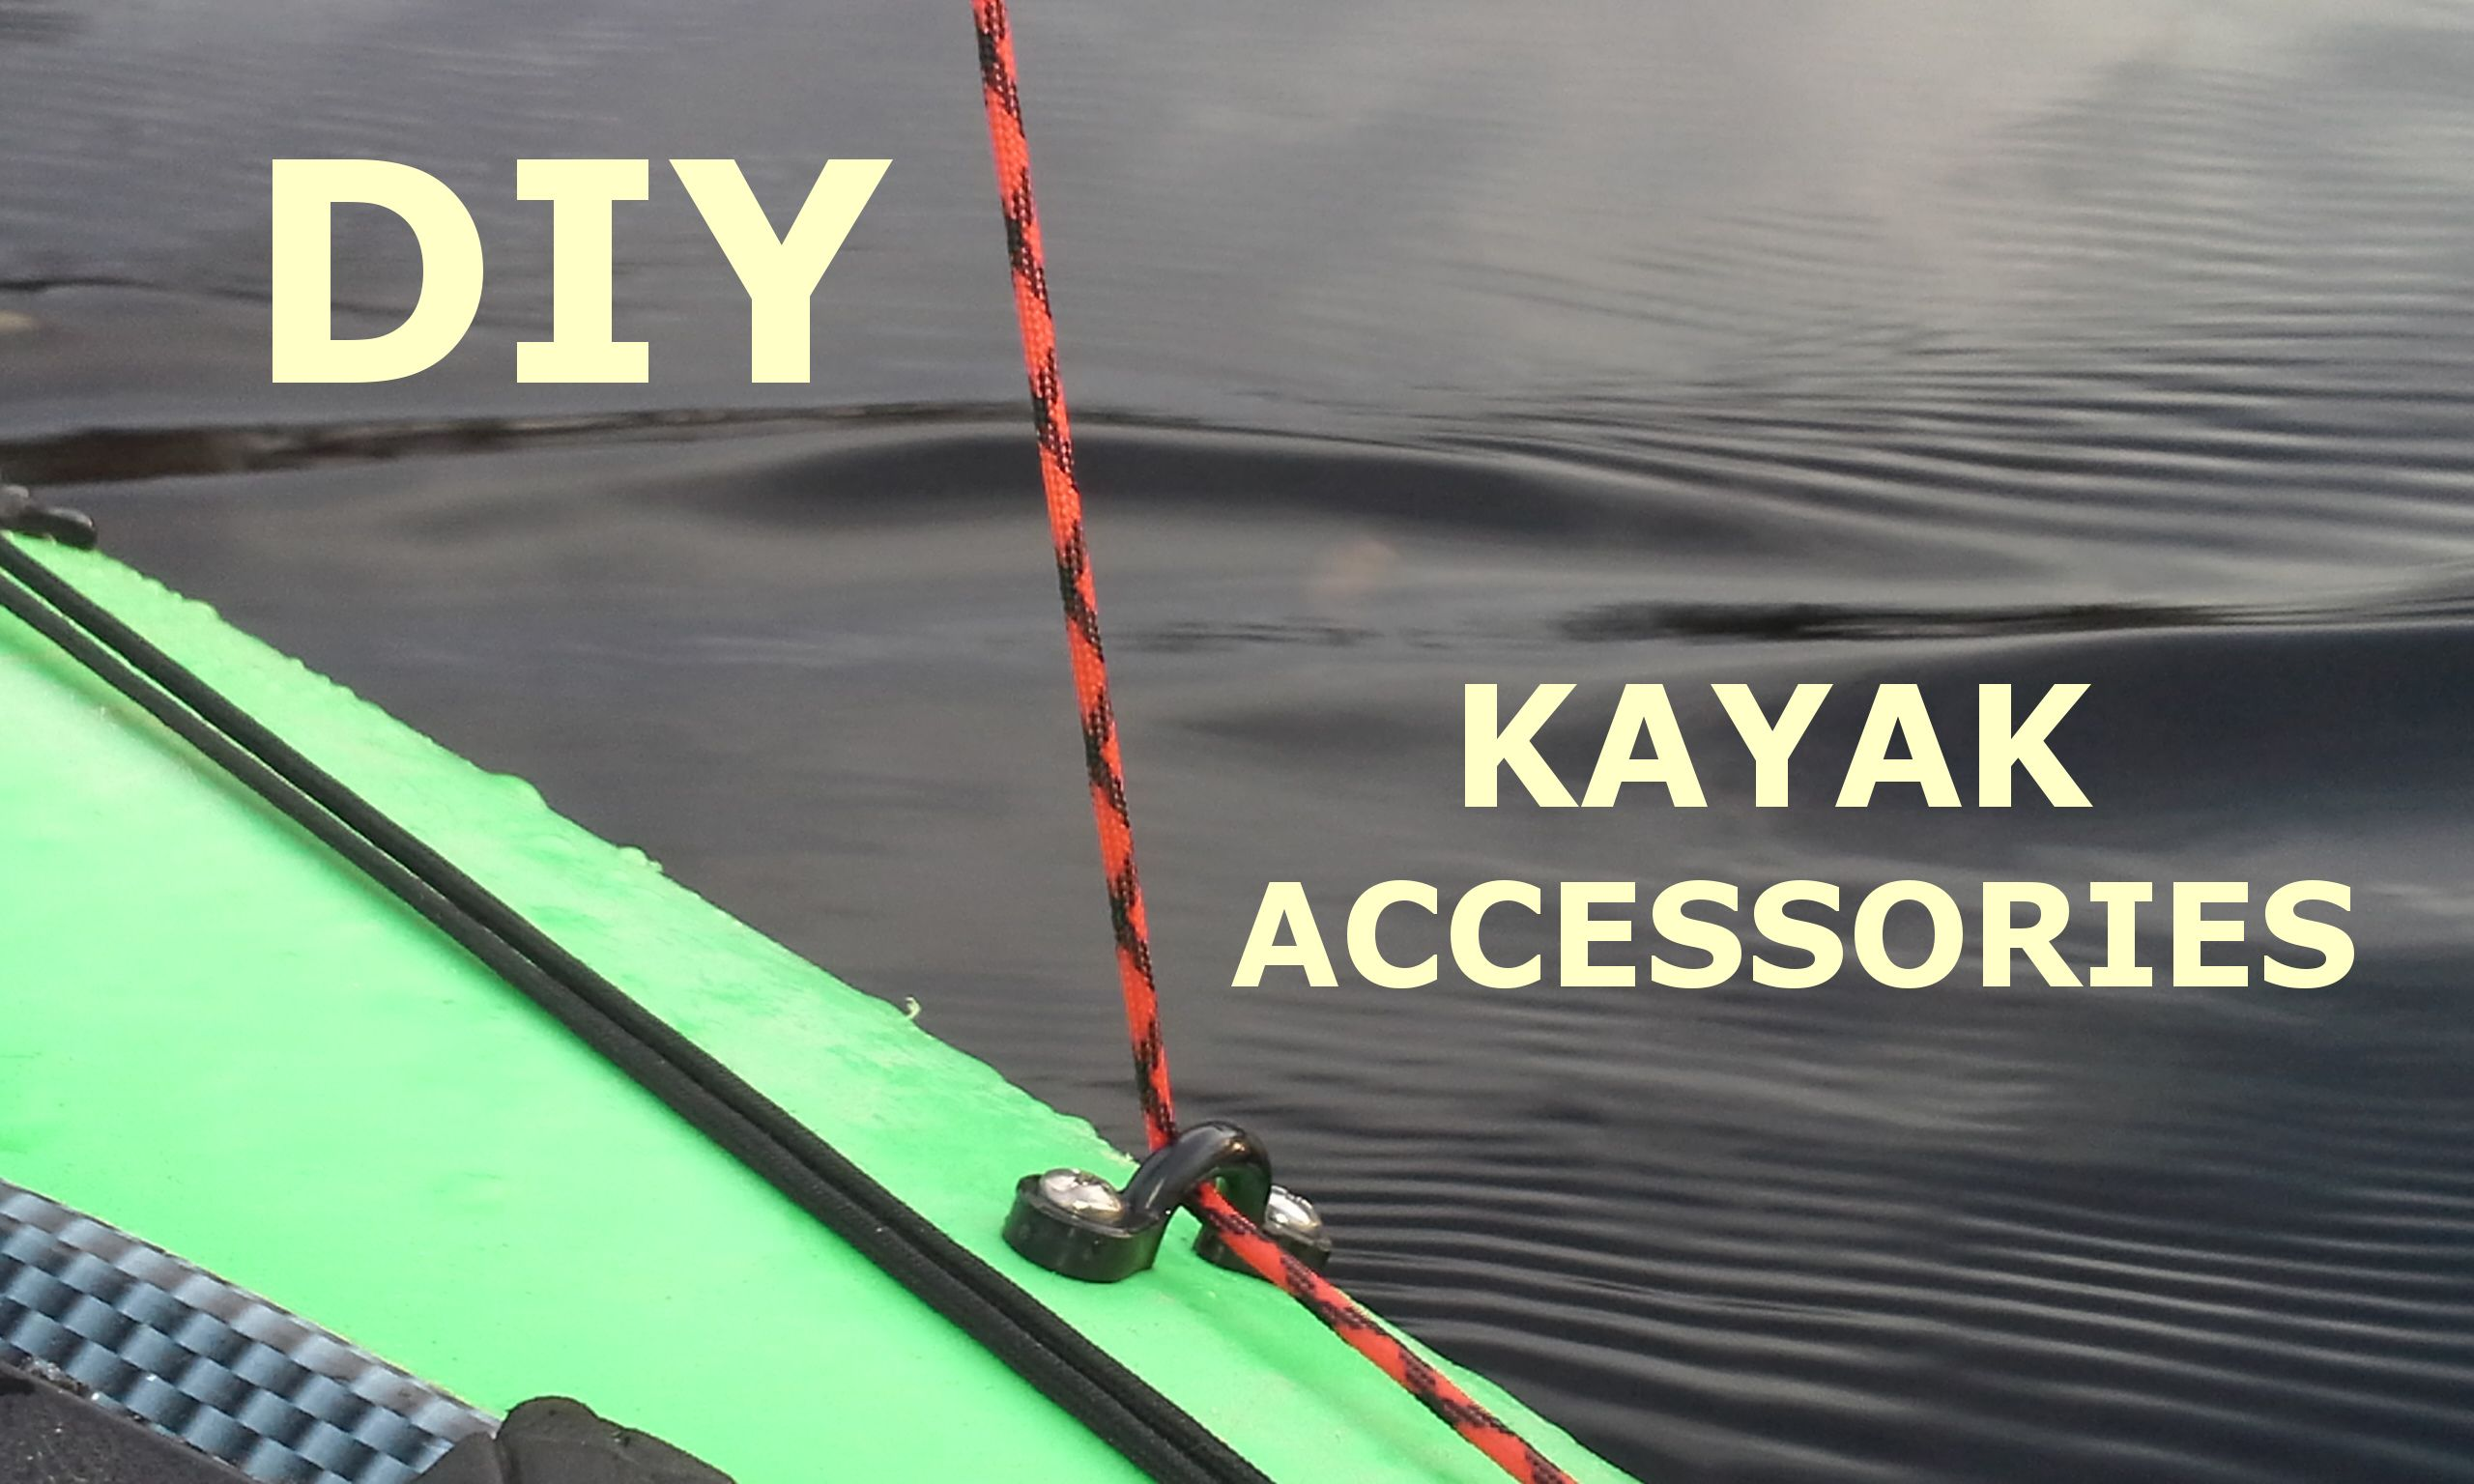 Diy Kayak Accessories At Kayaking Ct With Lou Kayak Accessories Kayak Fishing Tips Kayak Fishing Setup